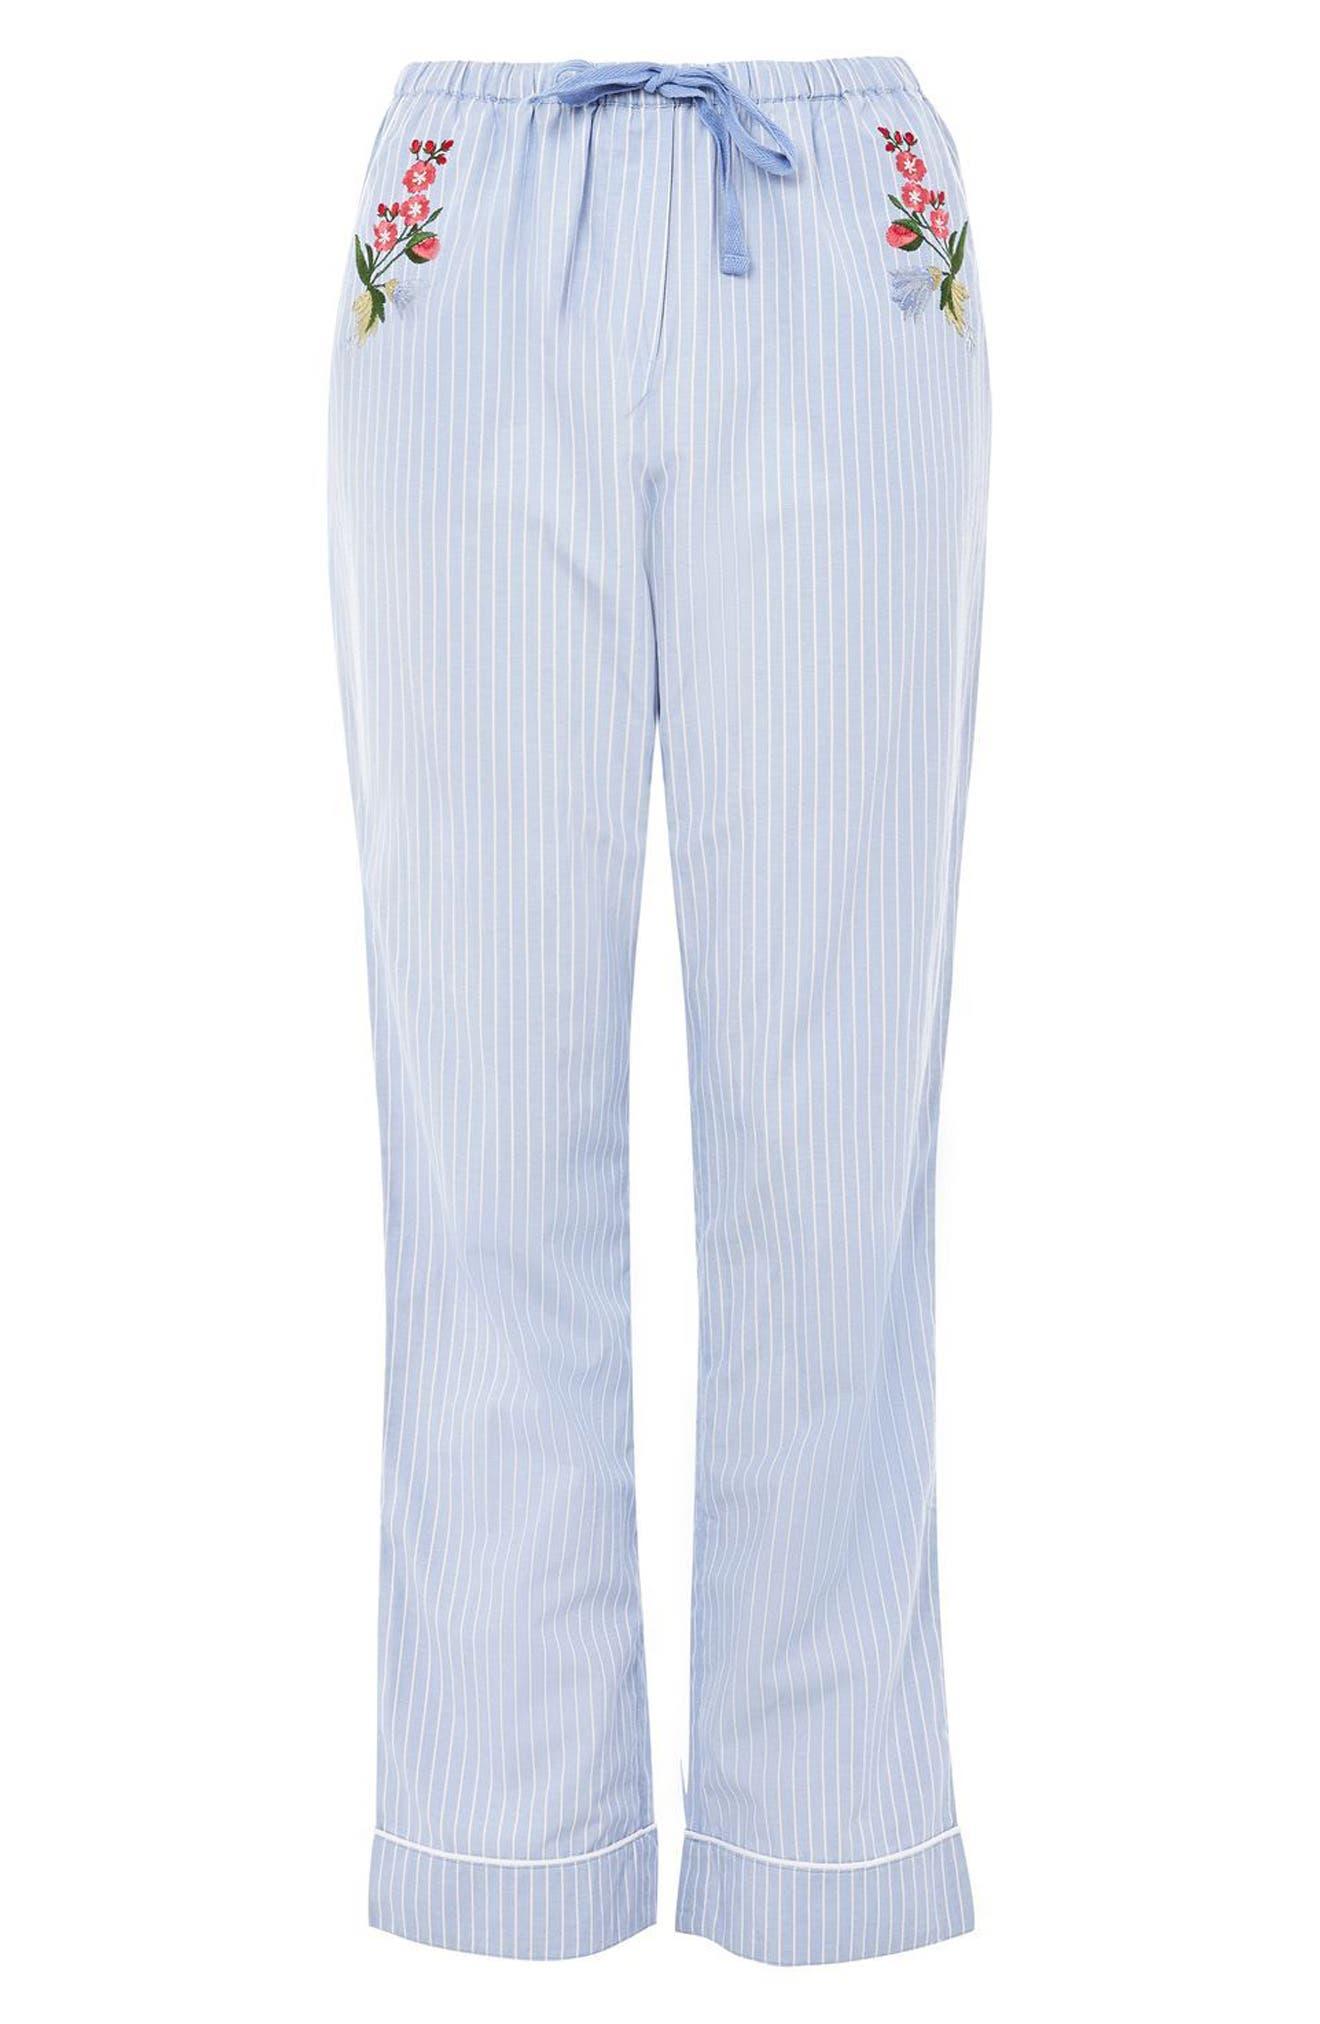 Alternate Image 3  - Topshop Floral Embroidered Stripe Pajama Pants